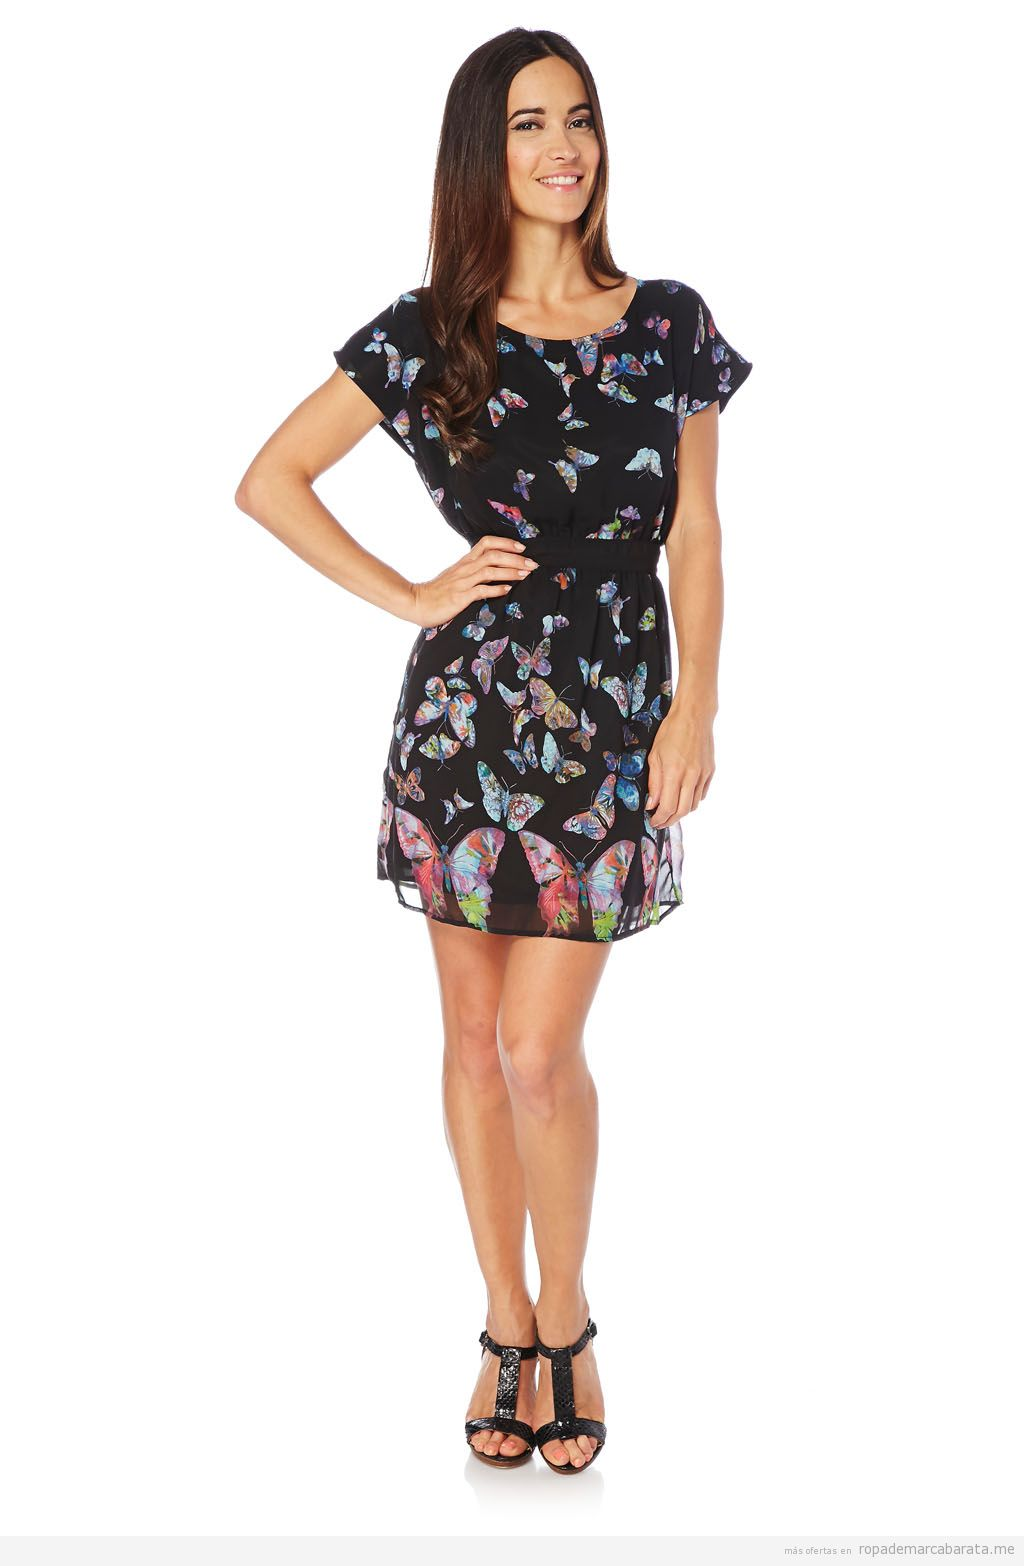 Vestidos marca Uttam Boutique baratos, outlet online 2